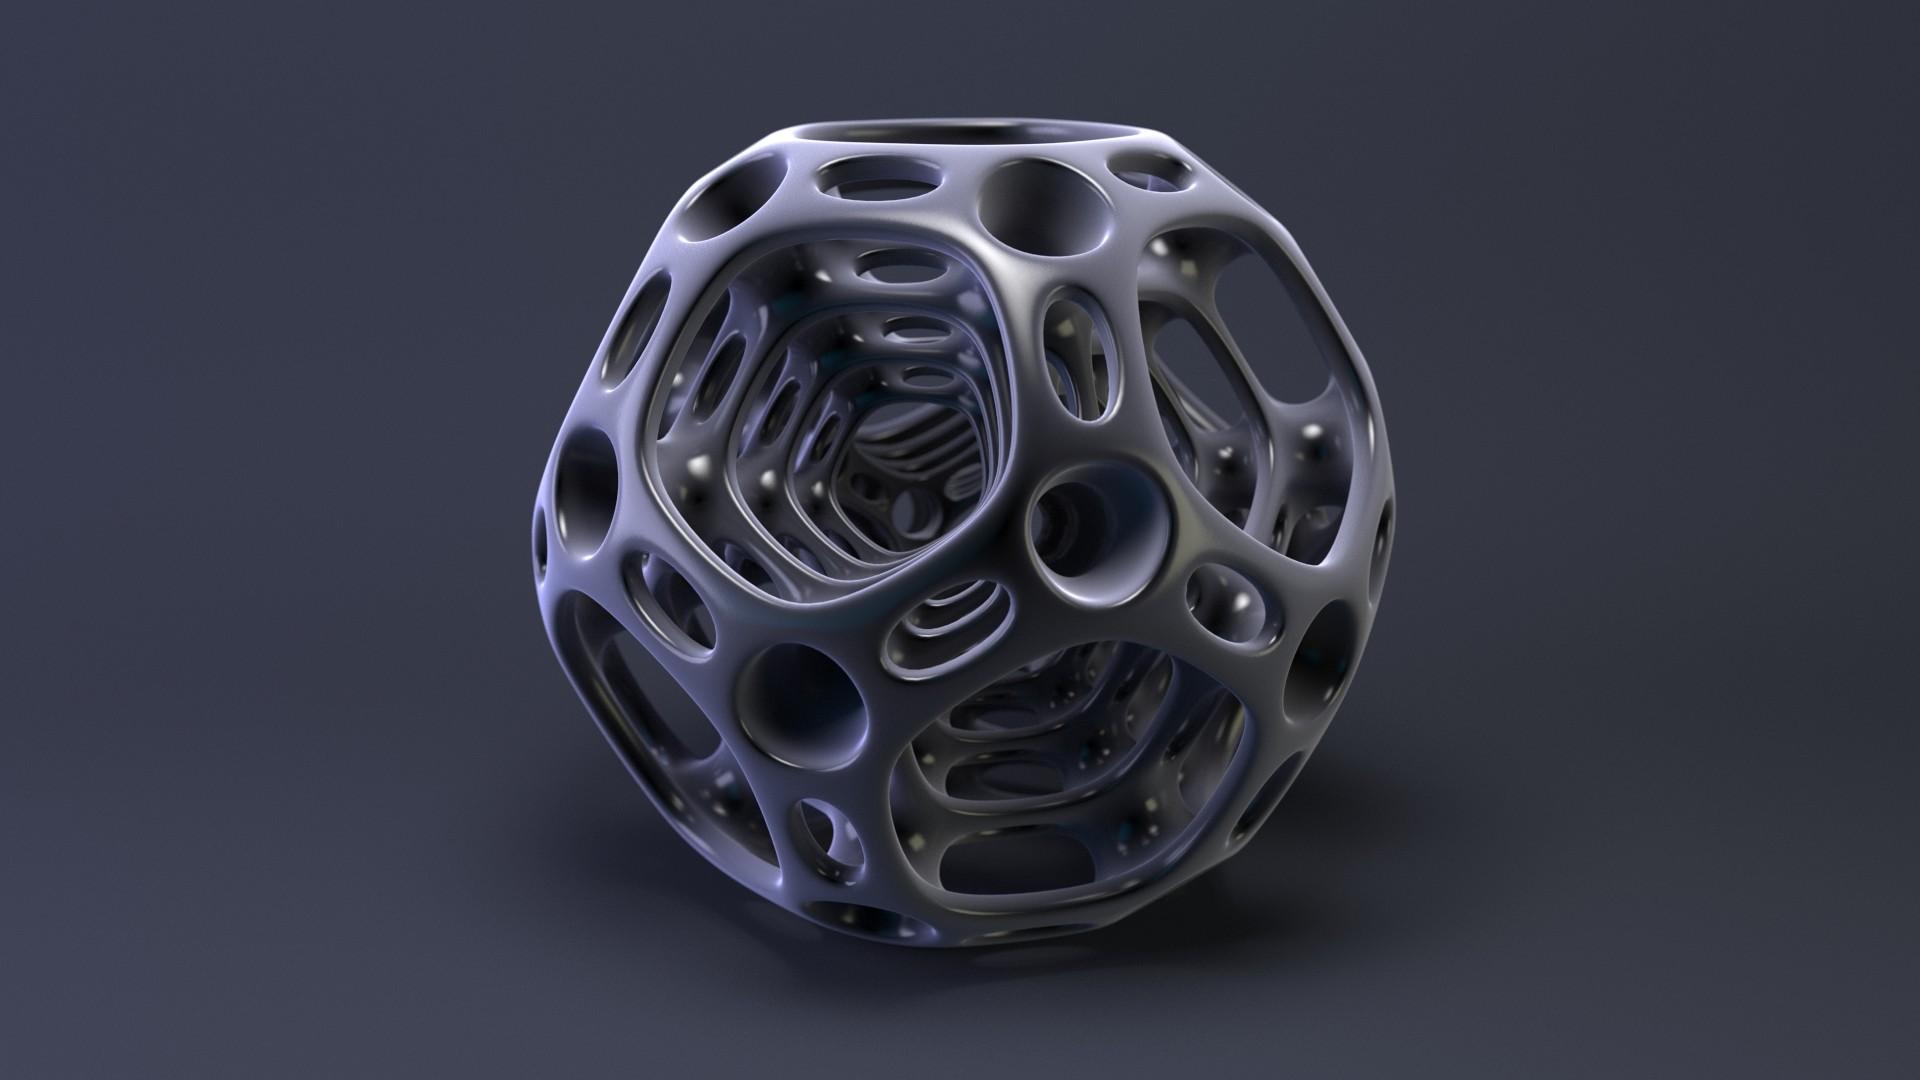 Michal mroszczak dodecahedron